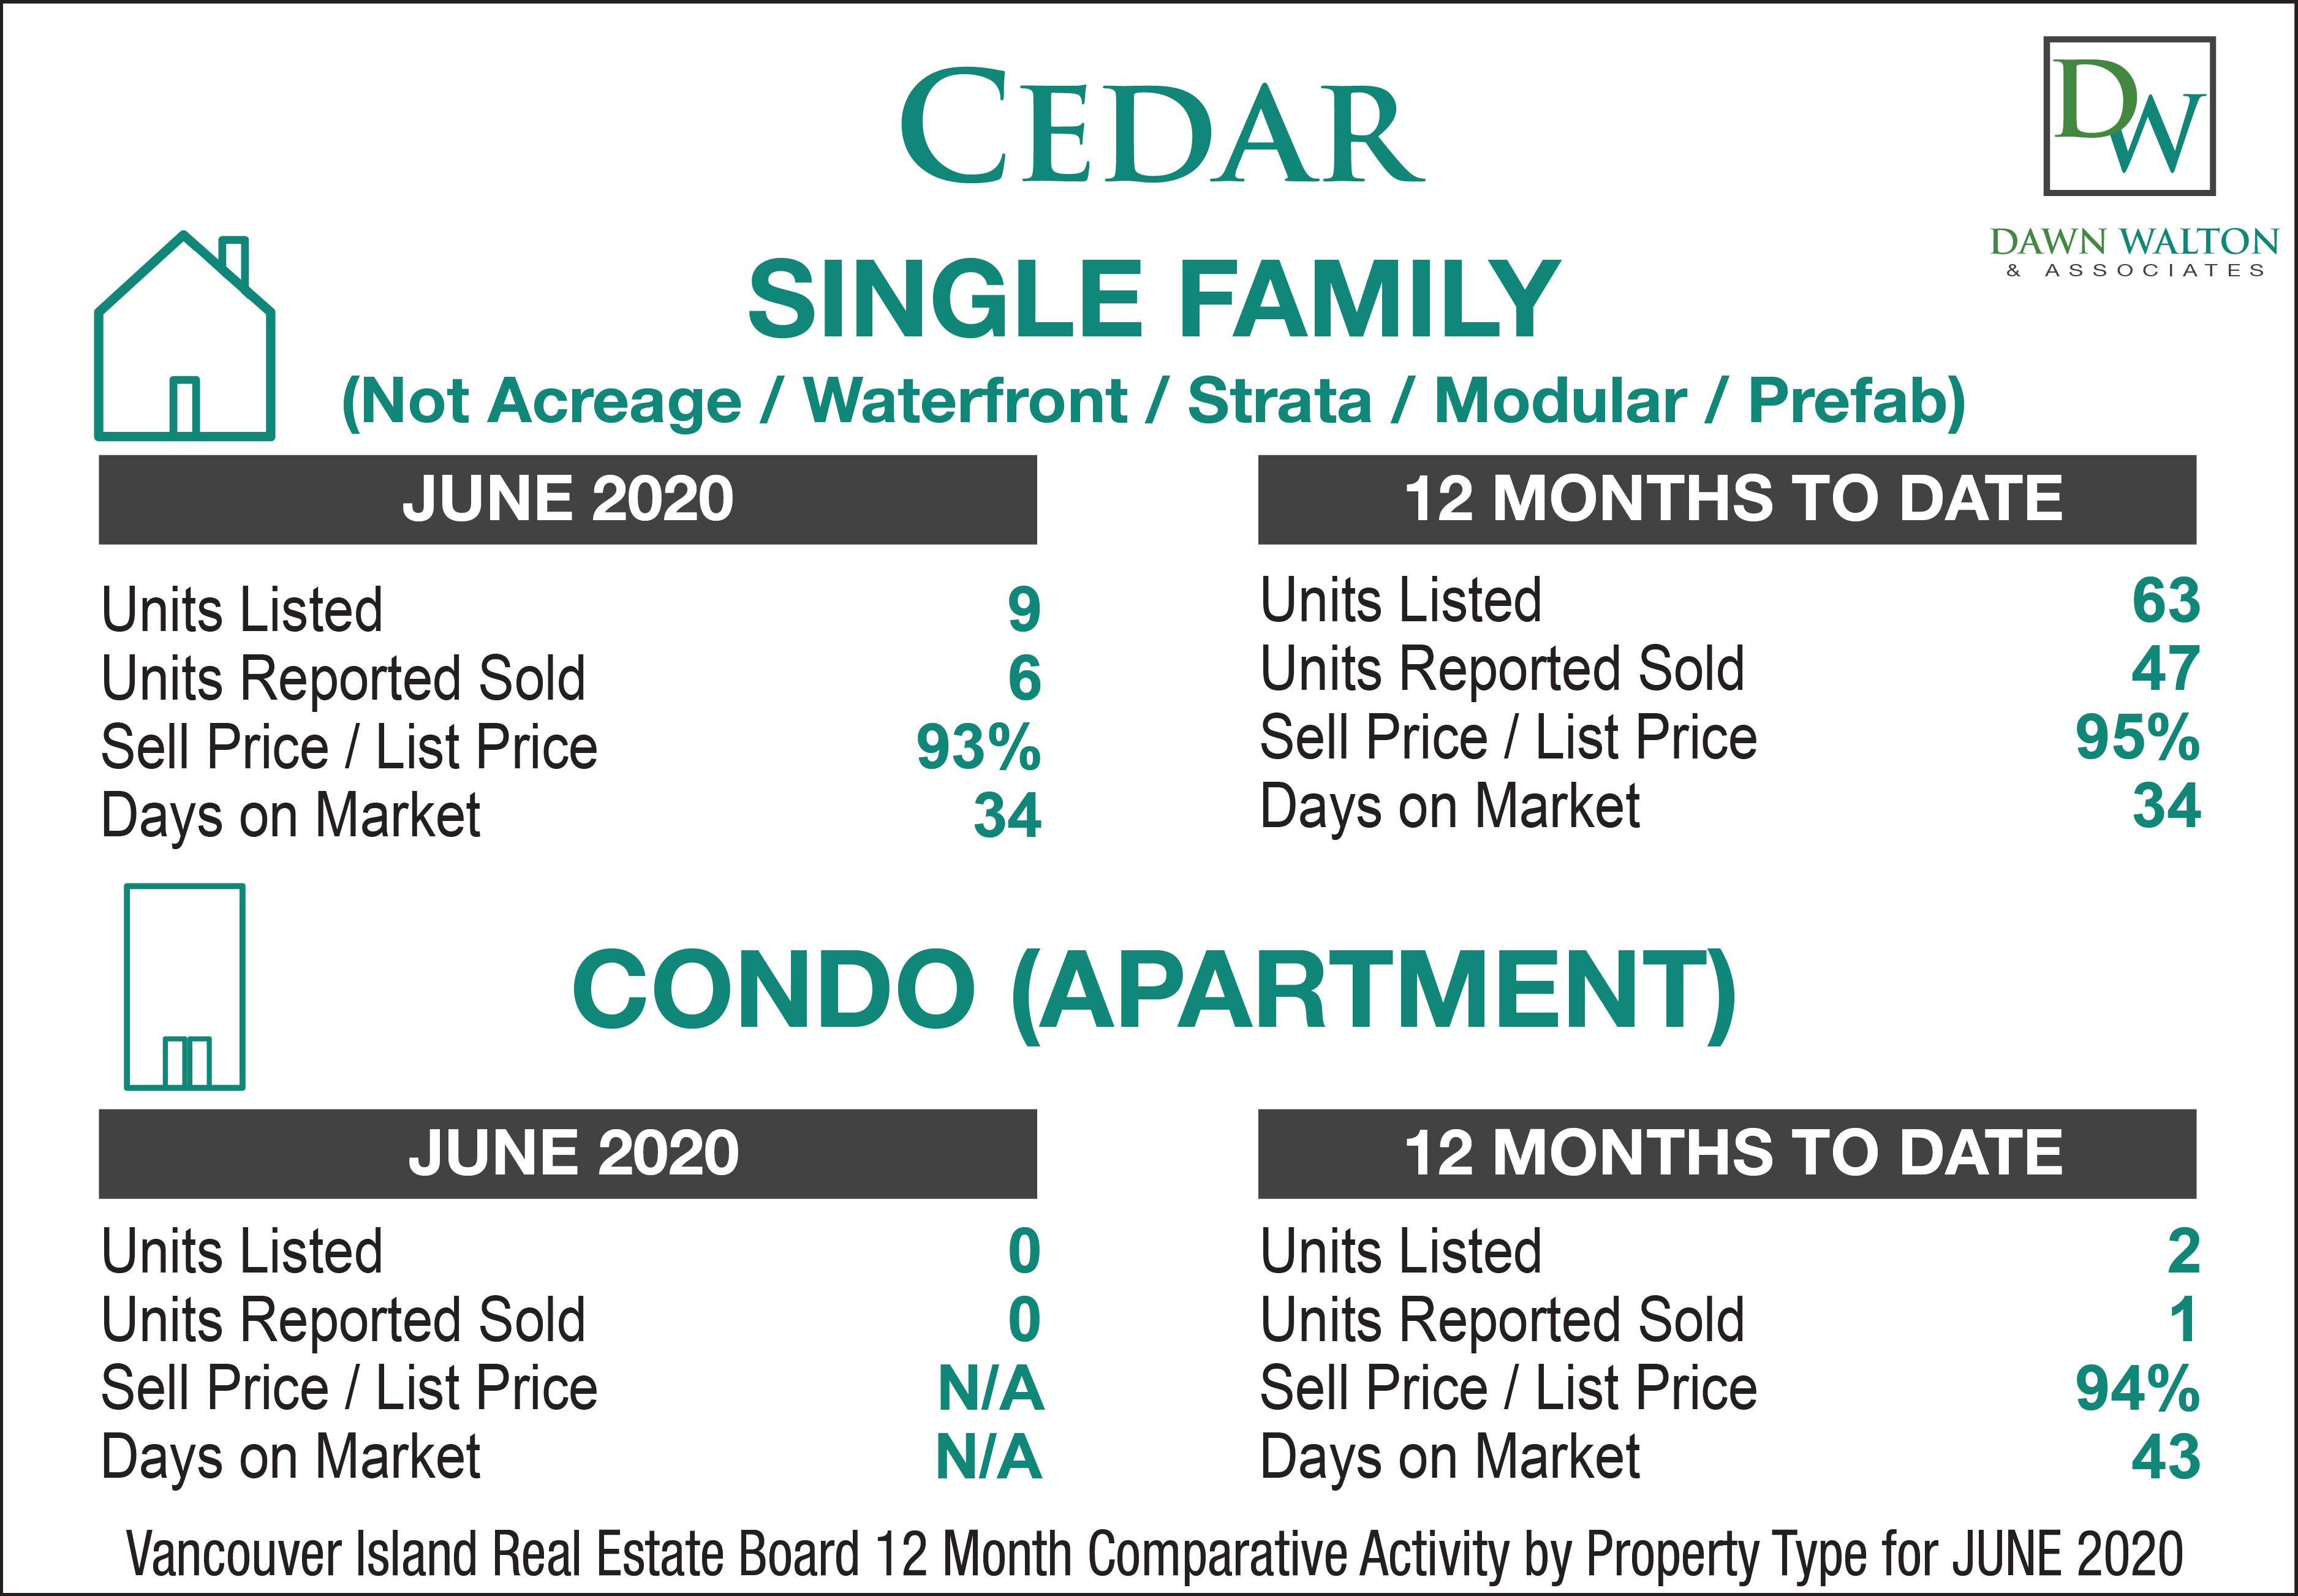 Cedar Real Estate Market Stats June 2020 - Nanaimo Realtor Dawn Walton